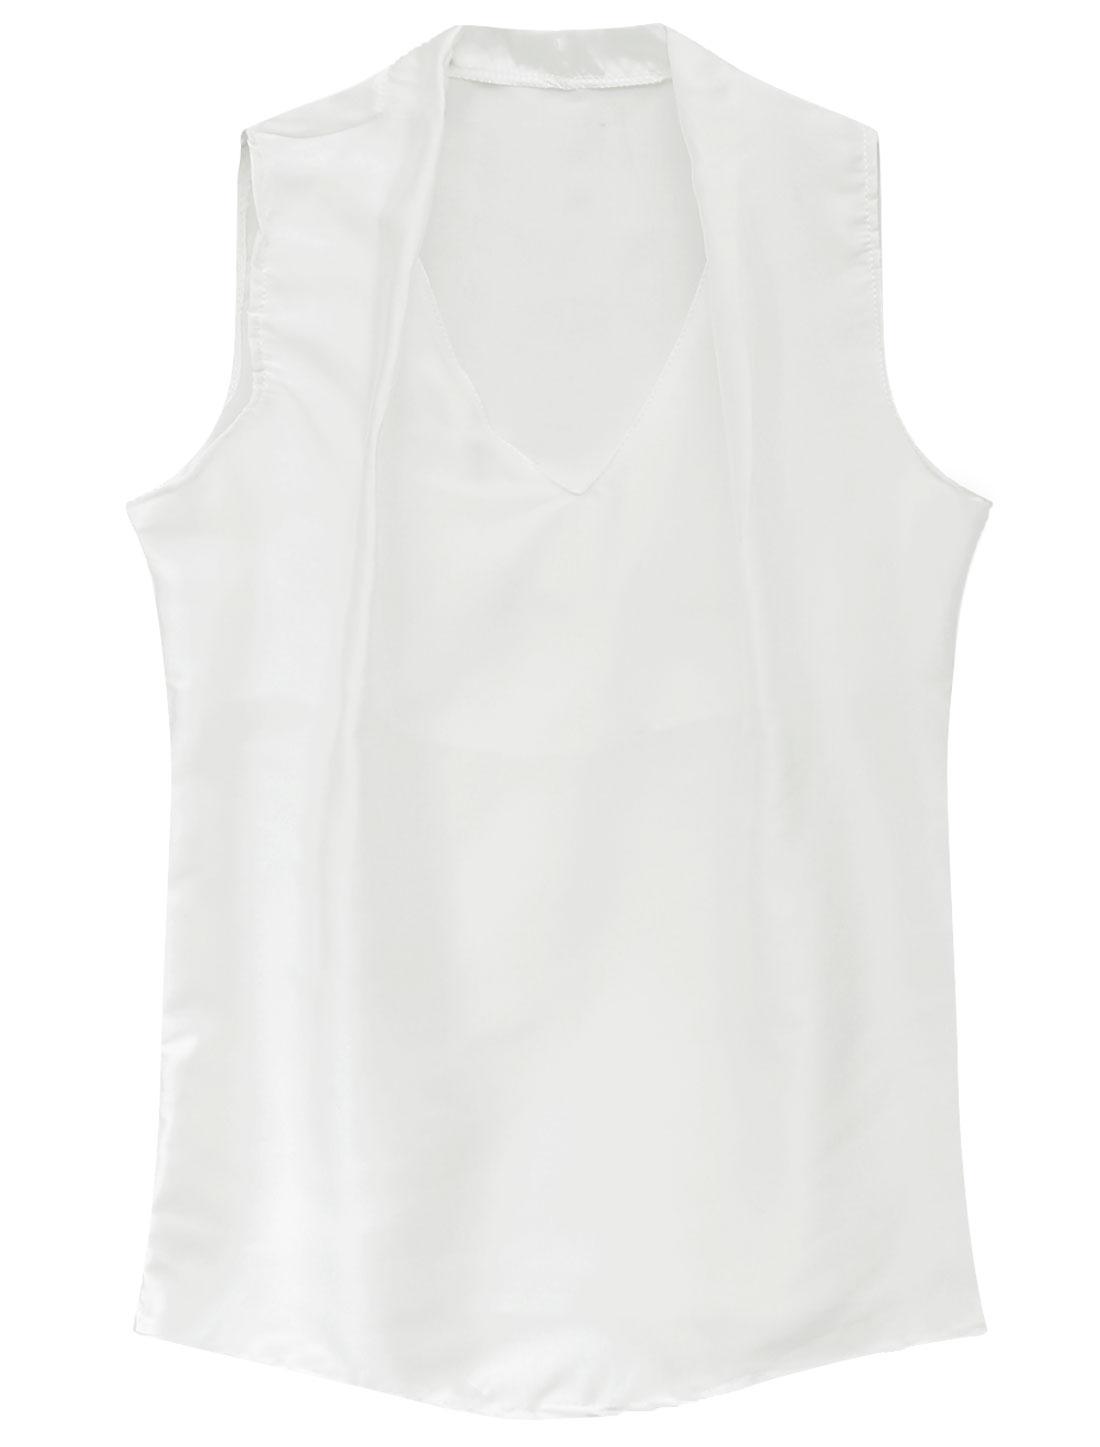 Lady V Neck Semi Sheer Casual Chiffon Blouse White S